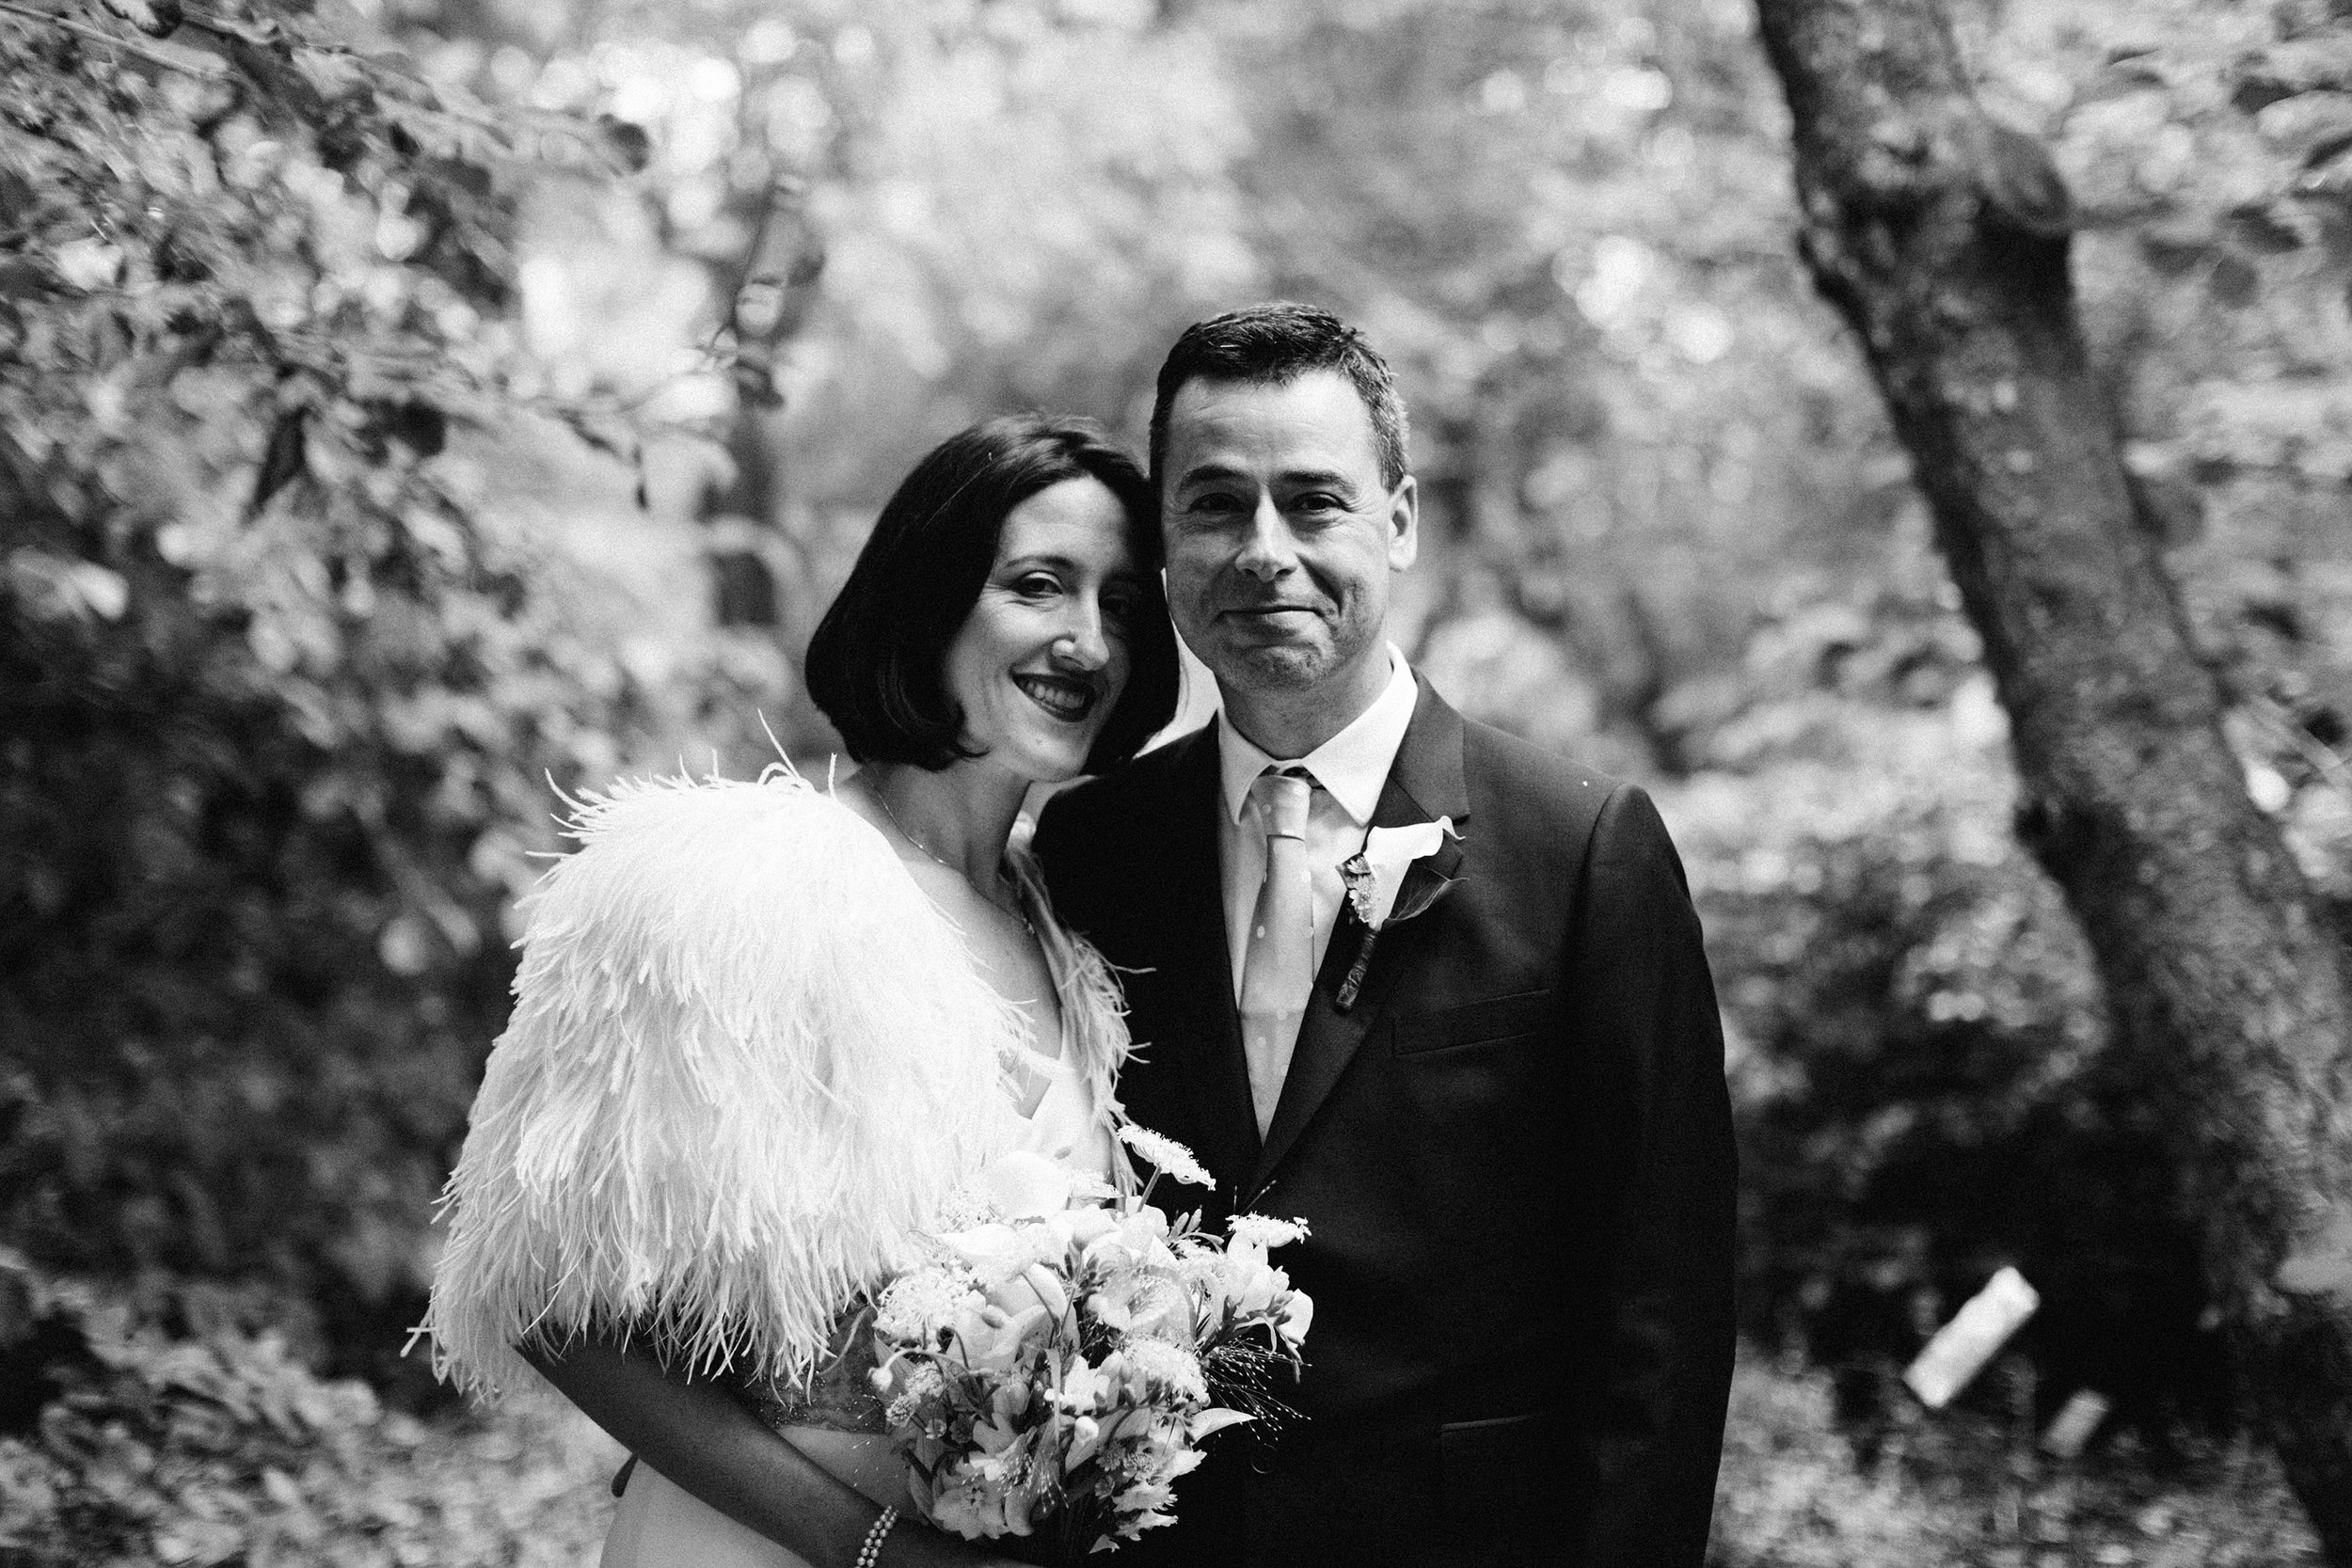 Amanda-and-Mark-8-Oct-2016-244.jpg